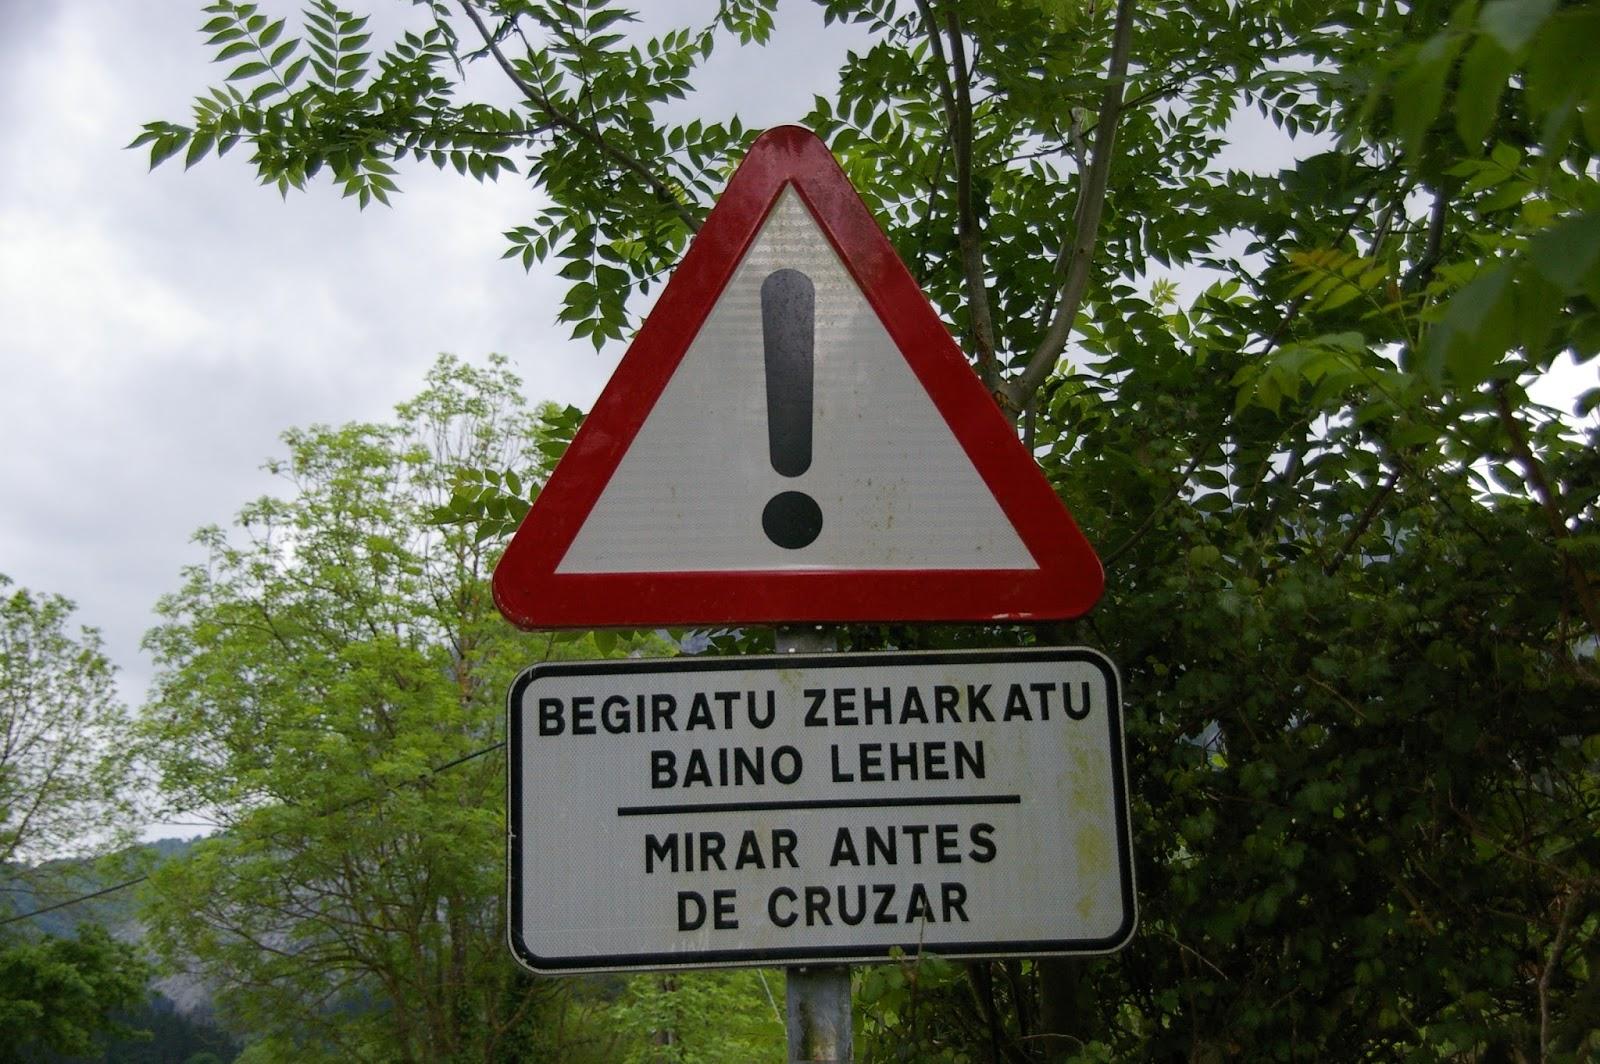 Kraj Basków euskera